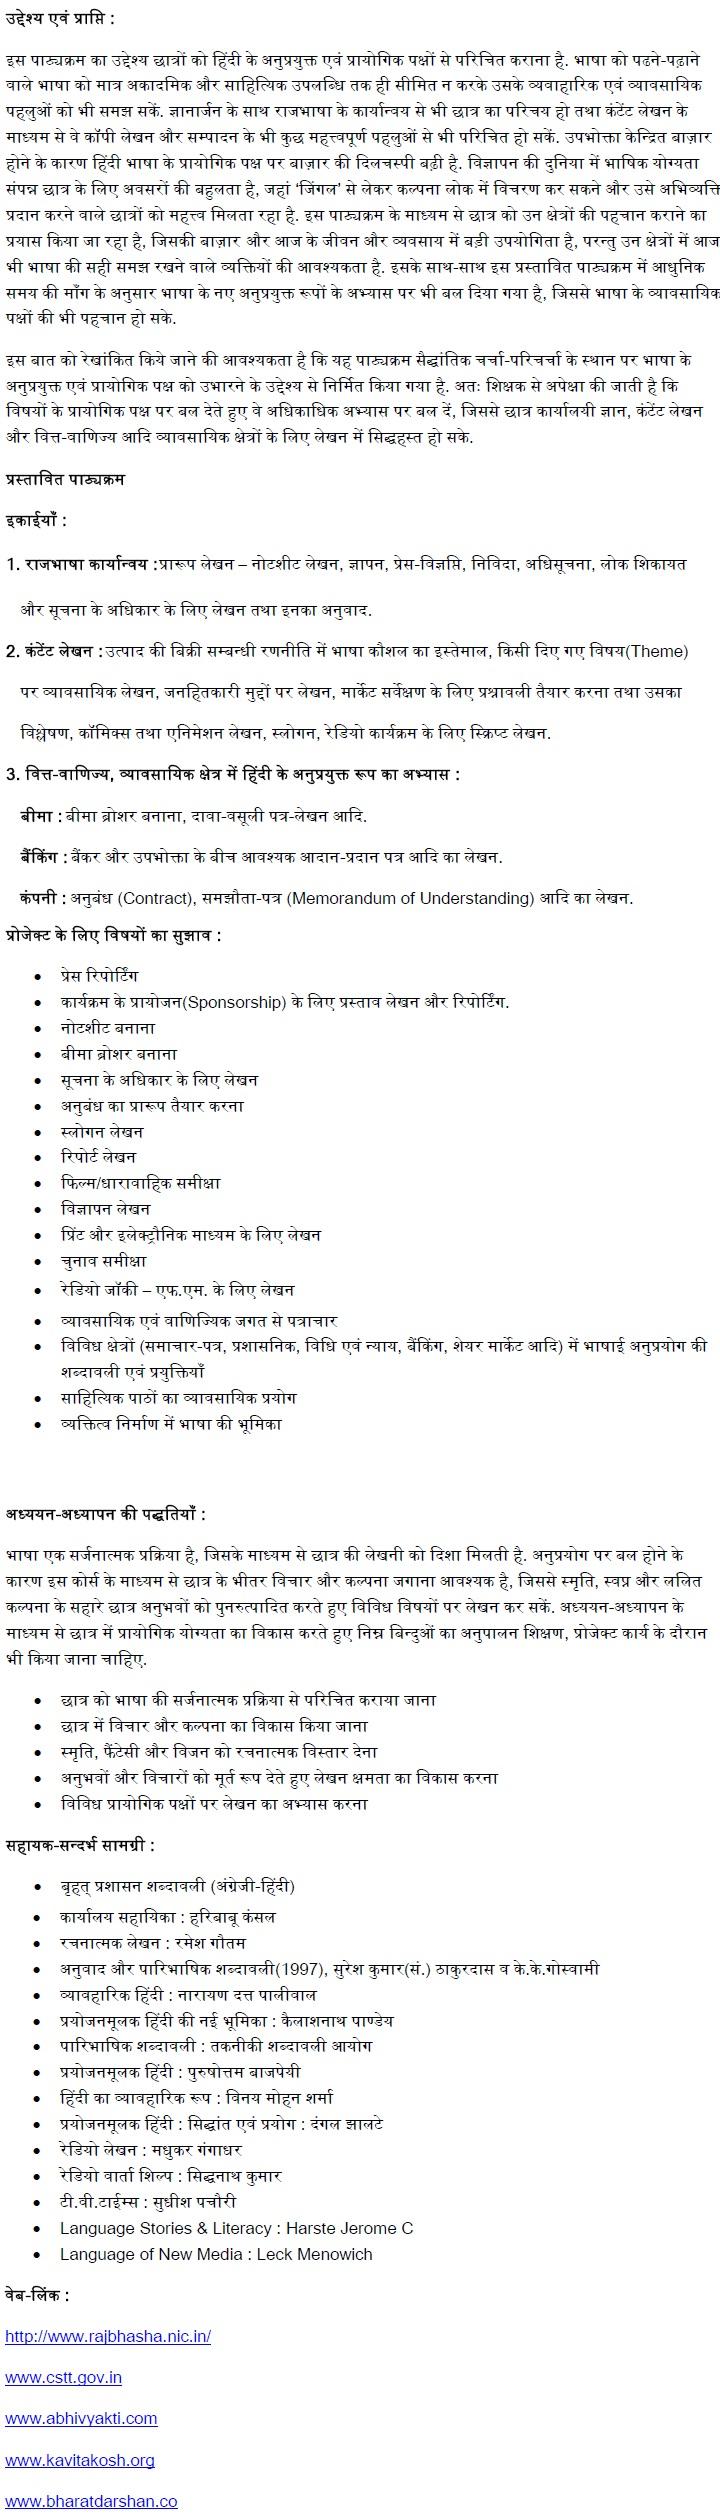 DU Foundation Course Syllabus - Applied Language Course - Hindi